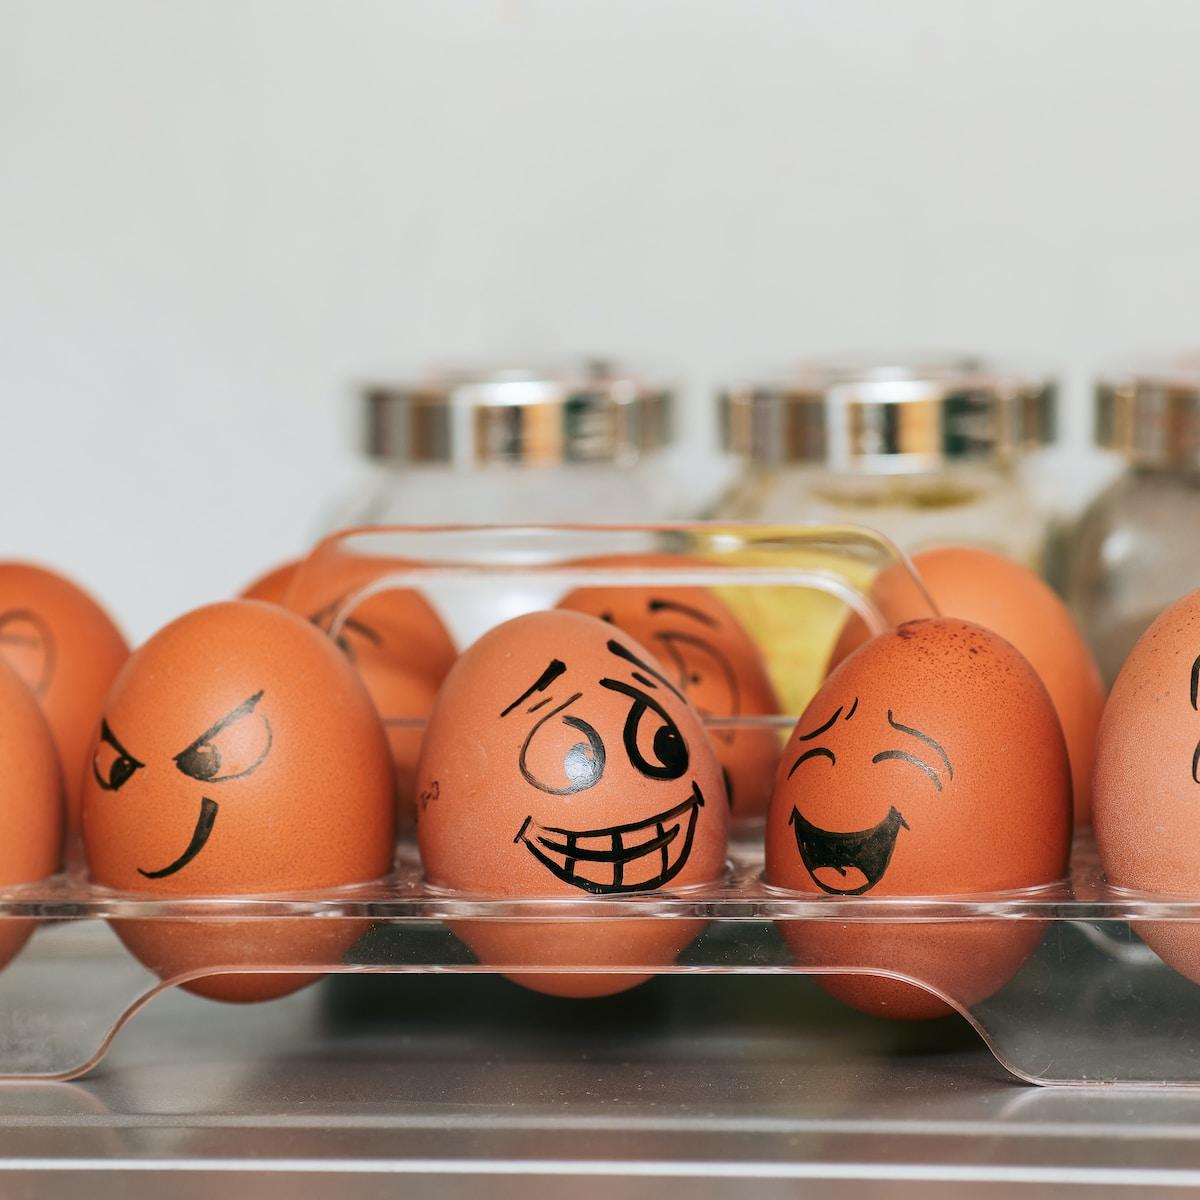 huevos, nevera, orange and white egg on stainless steel rack